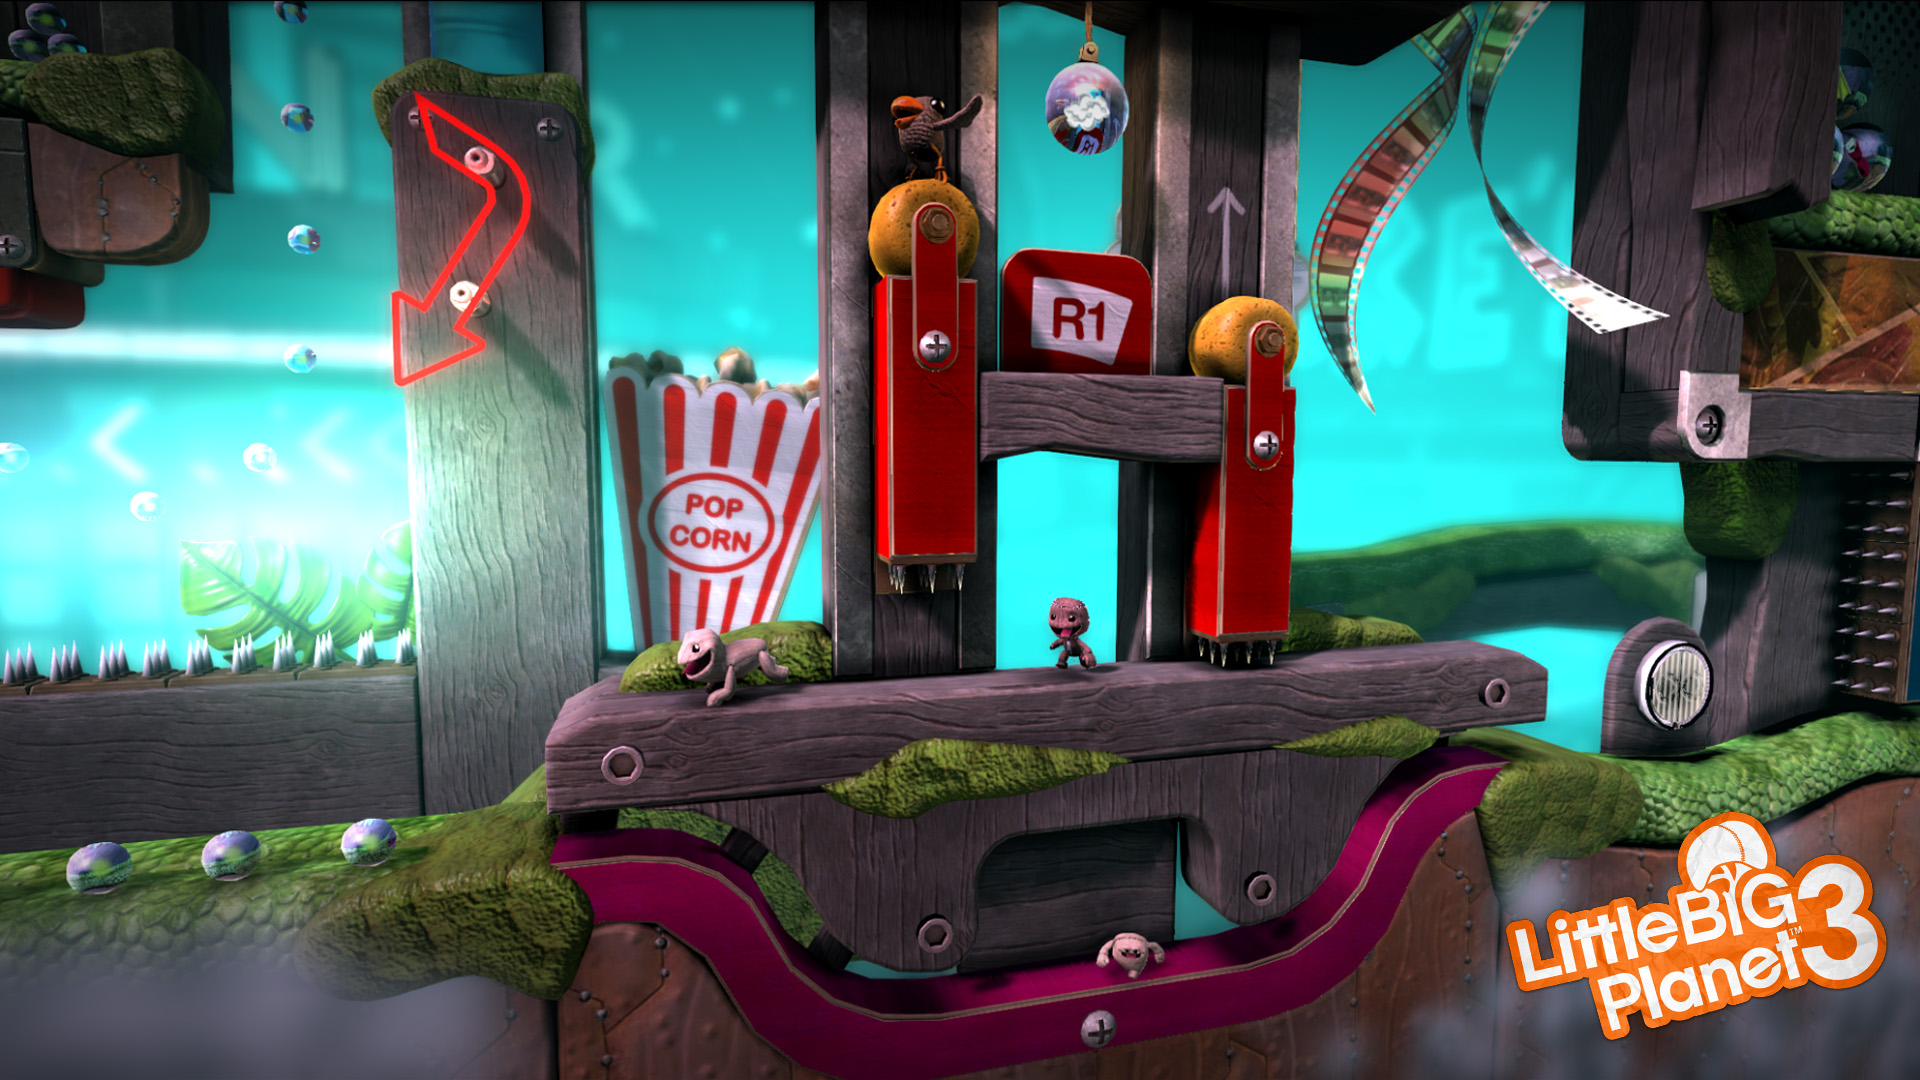 LittleBigPlanet3 PS4 Editeur 011